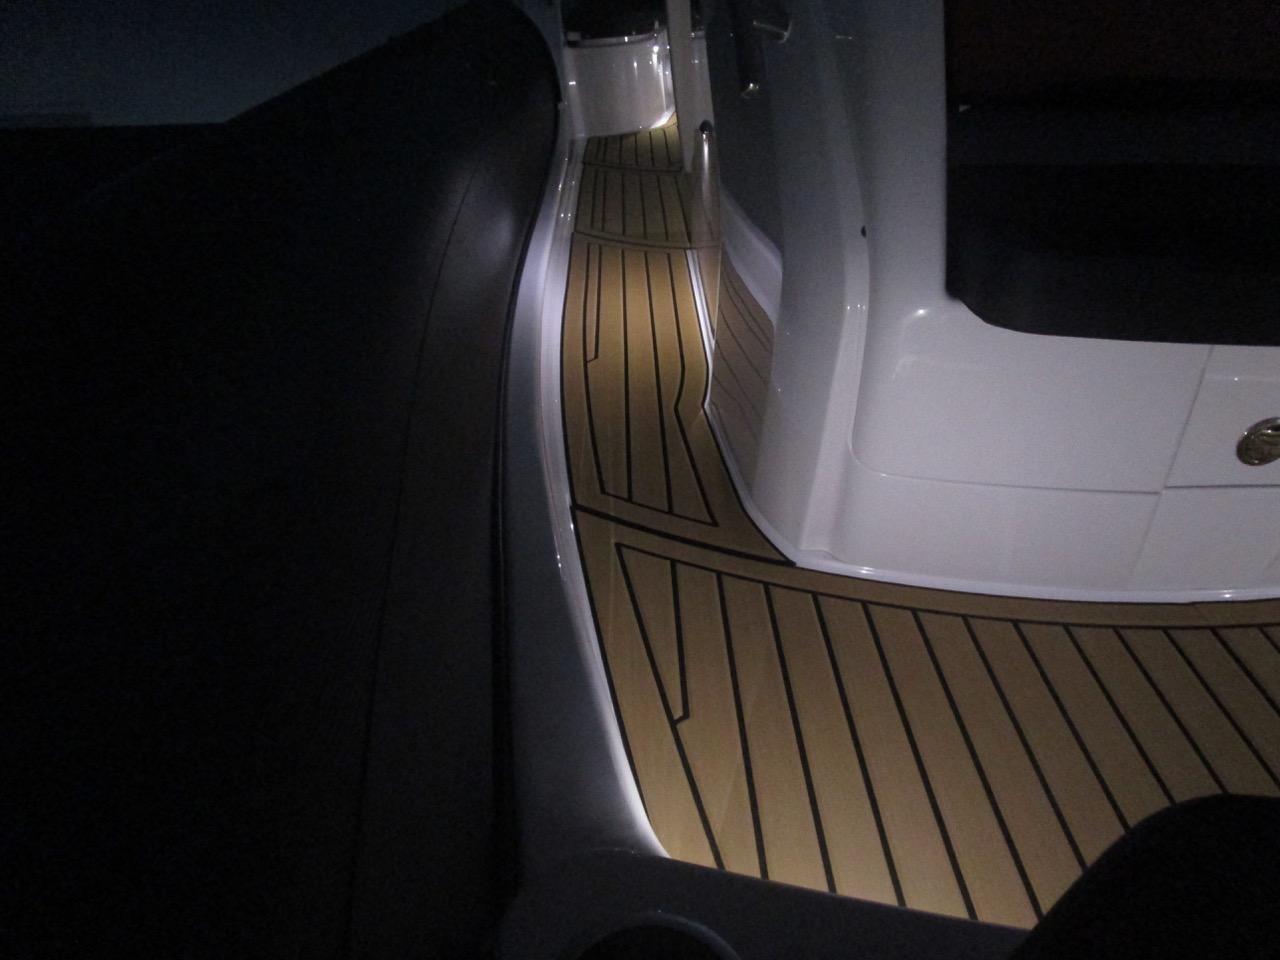 GRAND G850 RIB LED deck lights, stbd side decks